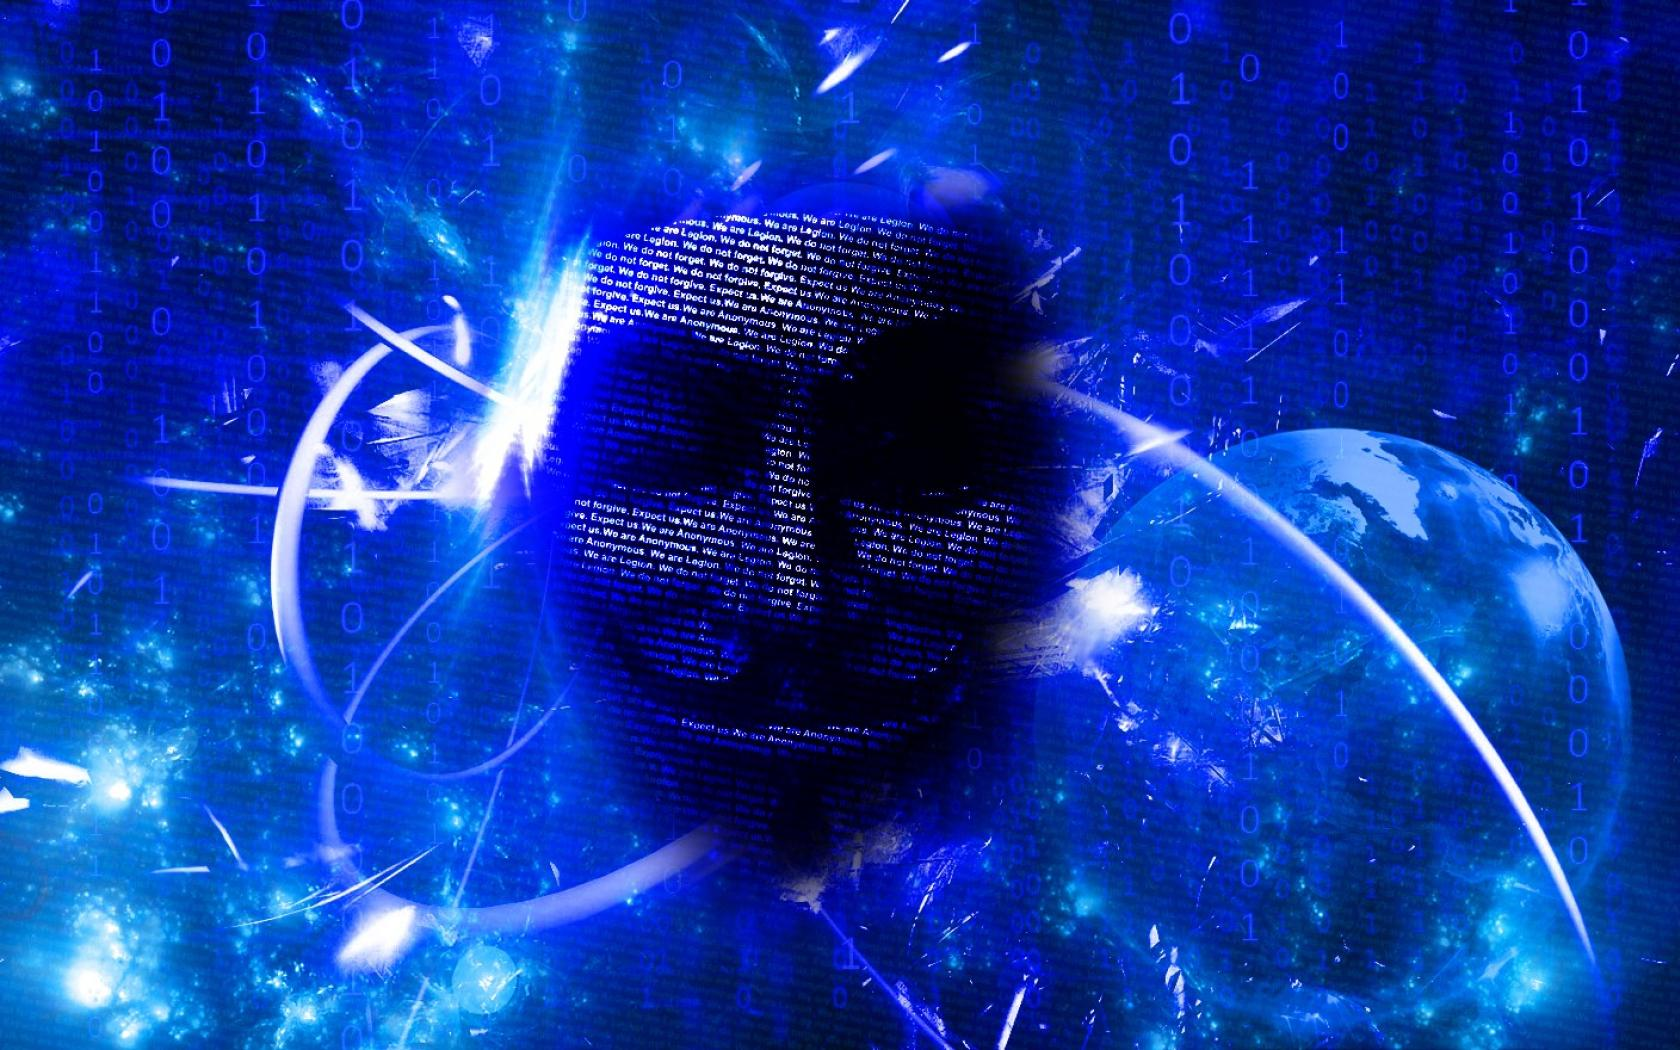 Abstract blue anonymous matrix binary code wallpaper 38462 1680x1050